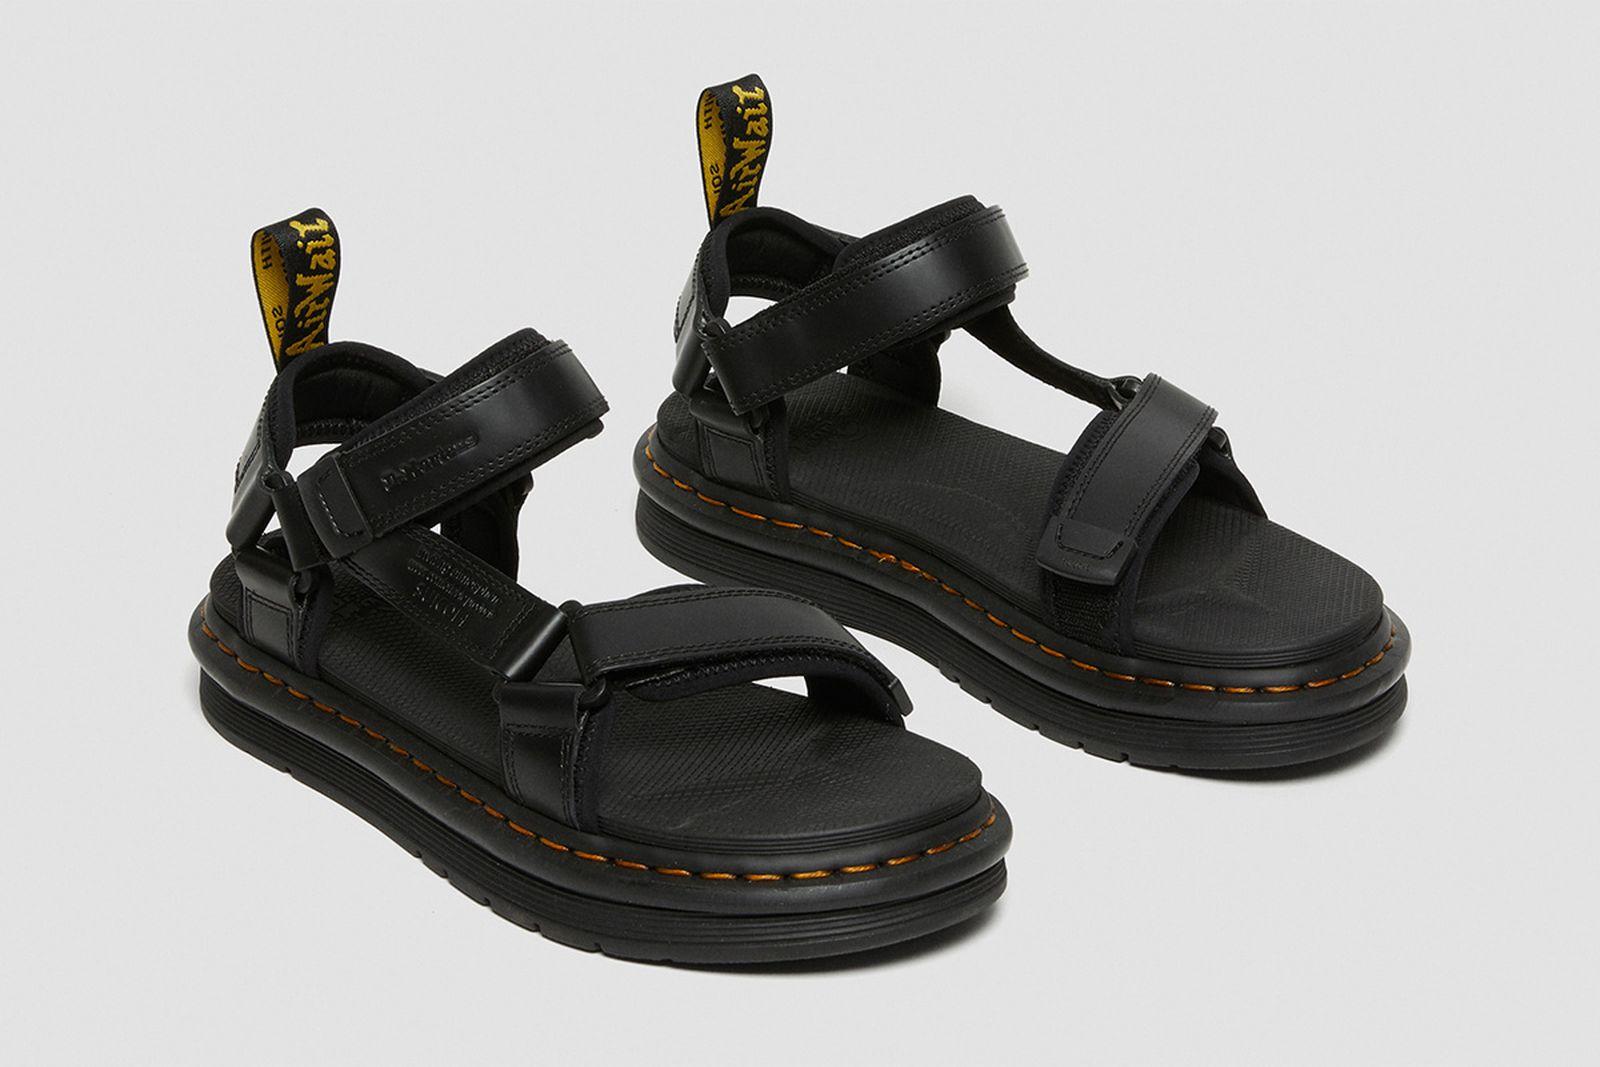 dr-martens-suicoke-sandals-release-date-price-05